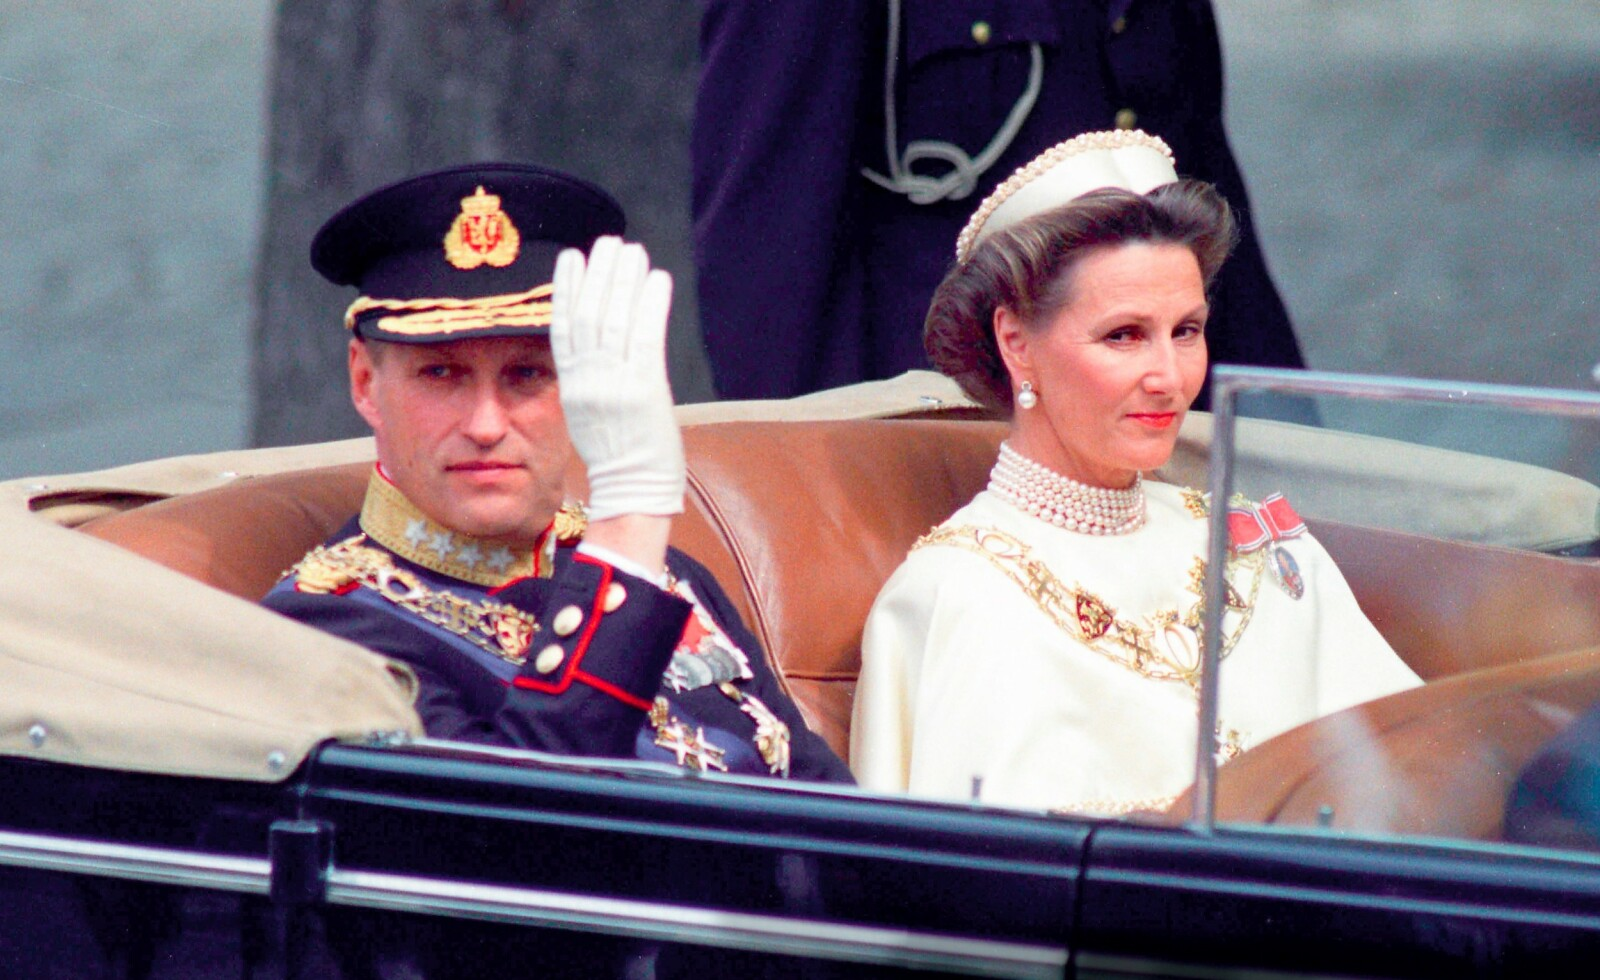 30 ÅR PÅ TRONEN: Kong Harald og dronning Sonja ble landets kongepar den 17. januar 1991. Foto: Se og Hør